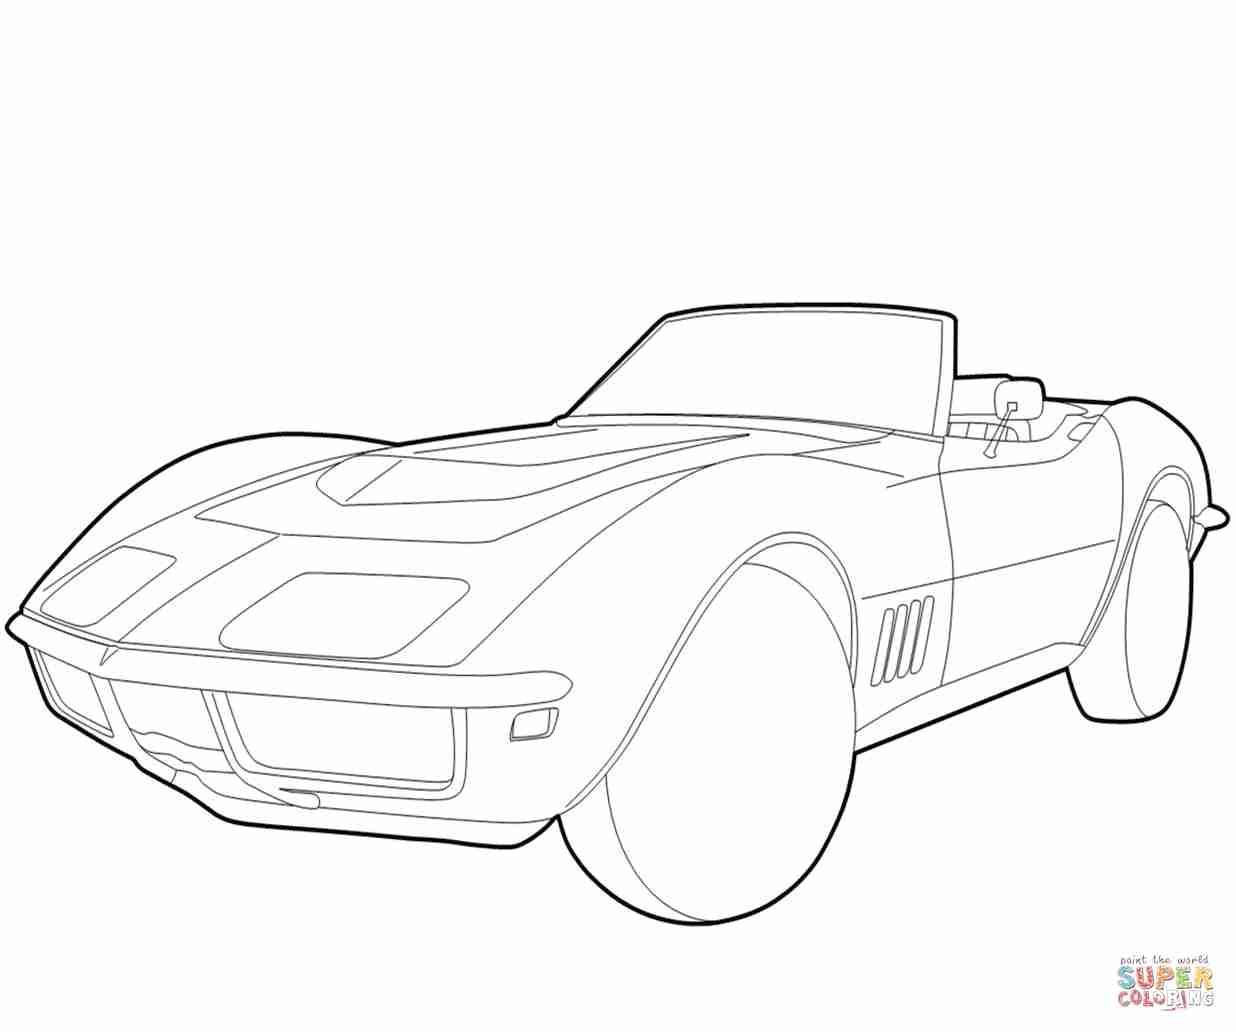 1236x1032 Chevrolet Corvette Coloring Page Free Printable Pages Fair Olegratiy